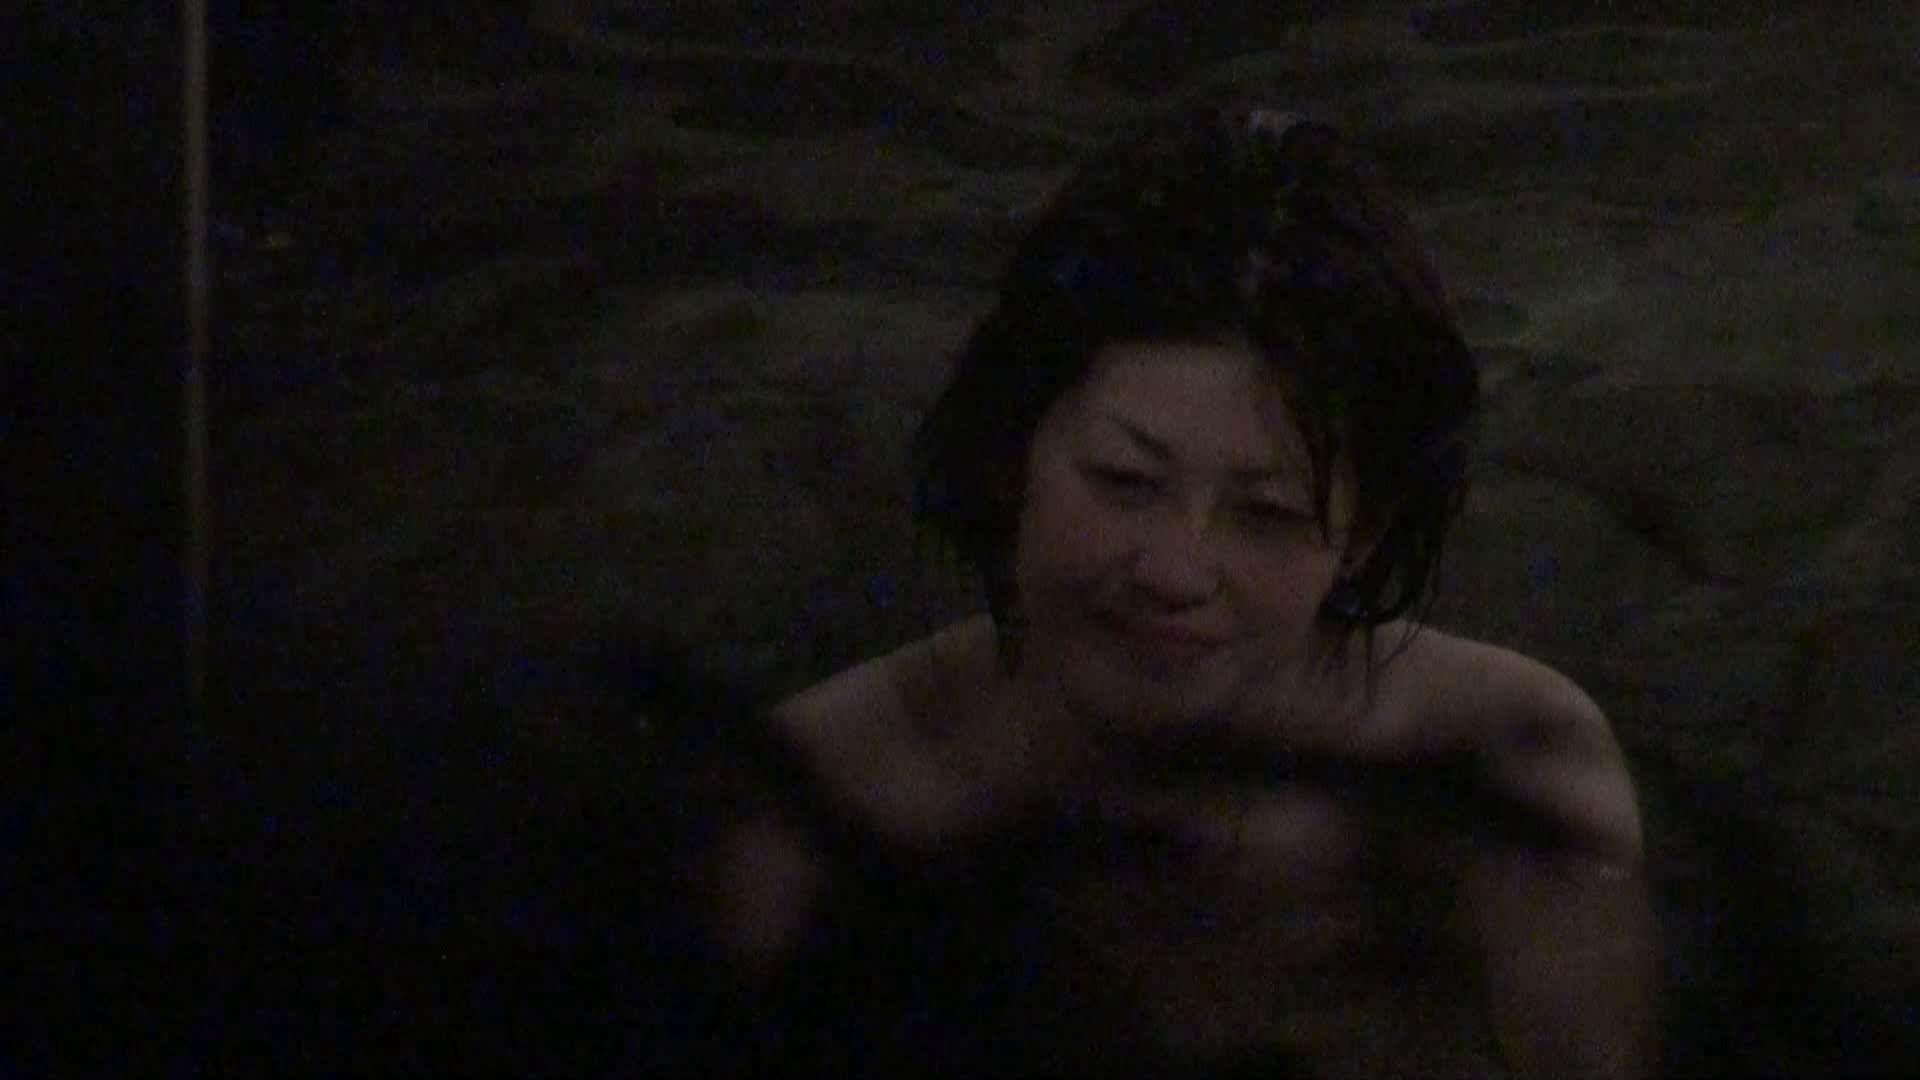 Aquaな露天風呂Vol.376 OLのエロ生活 | 露天風呂  109連発 34